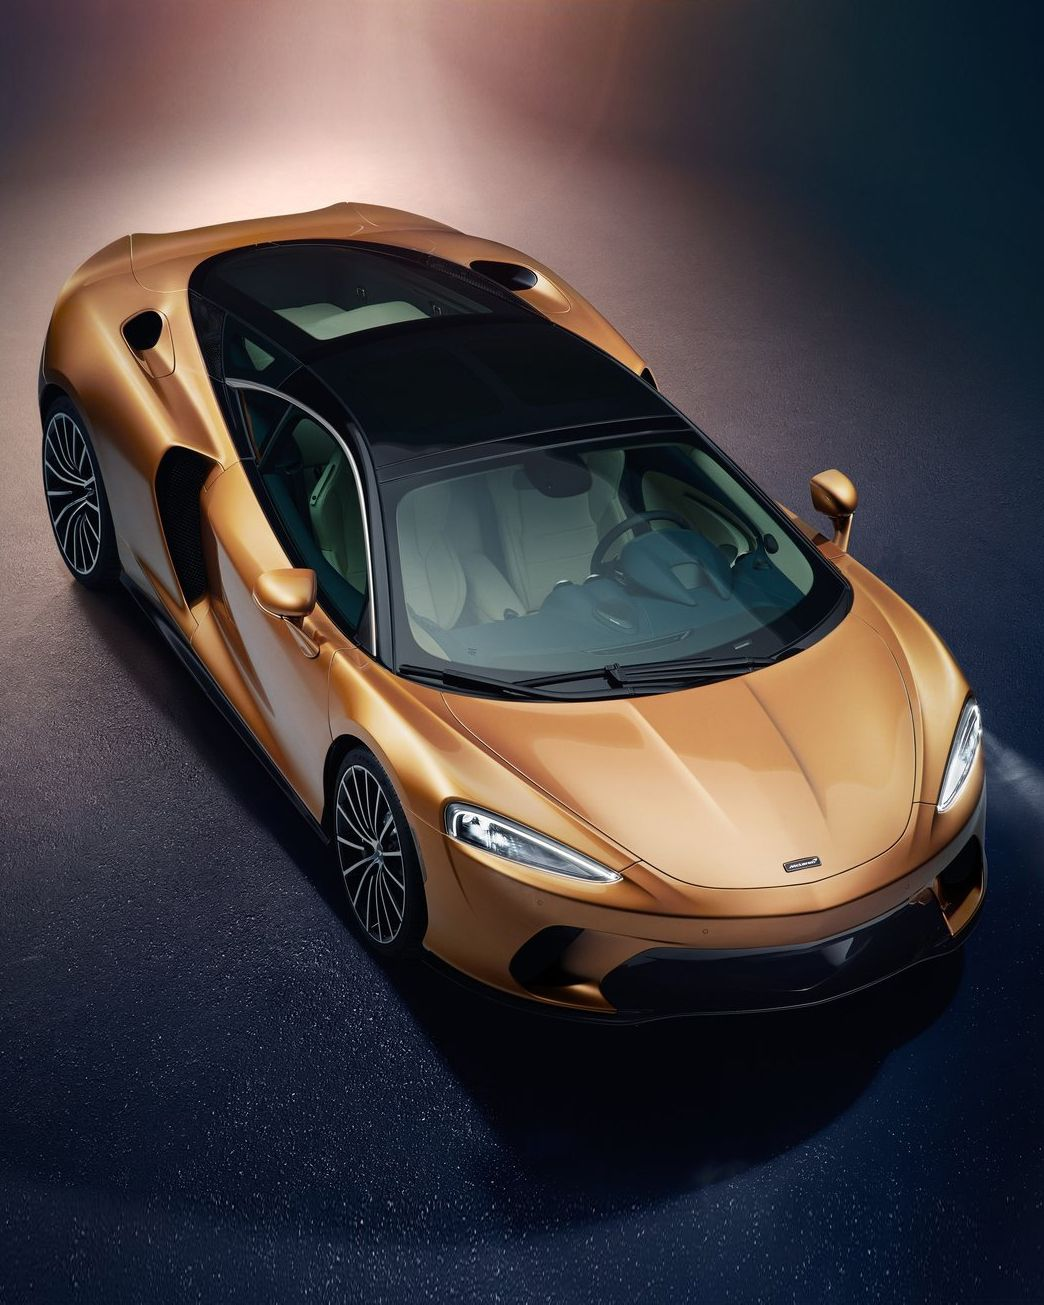 The MAN #McLaren #GT #supercar #luxury